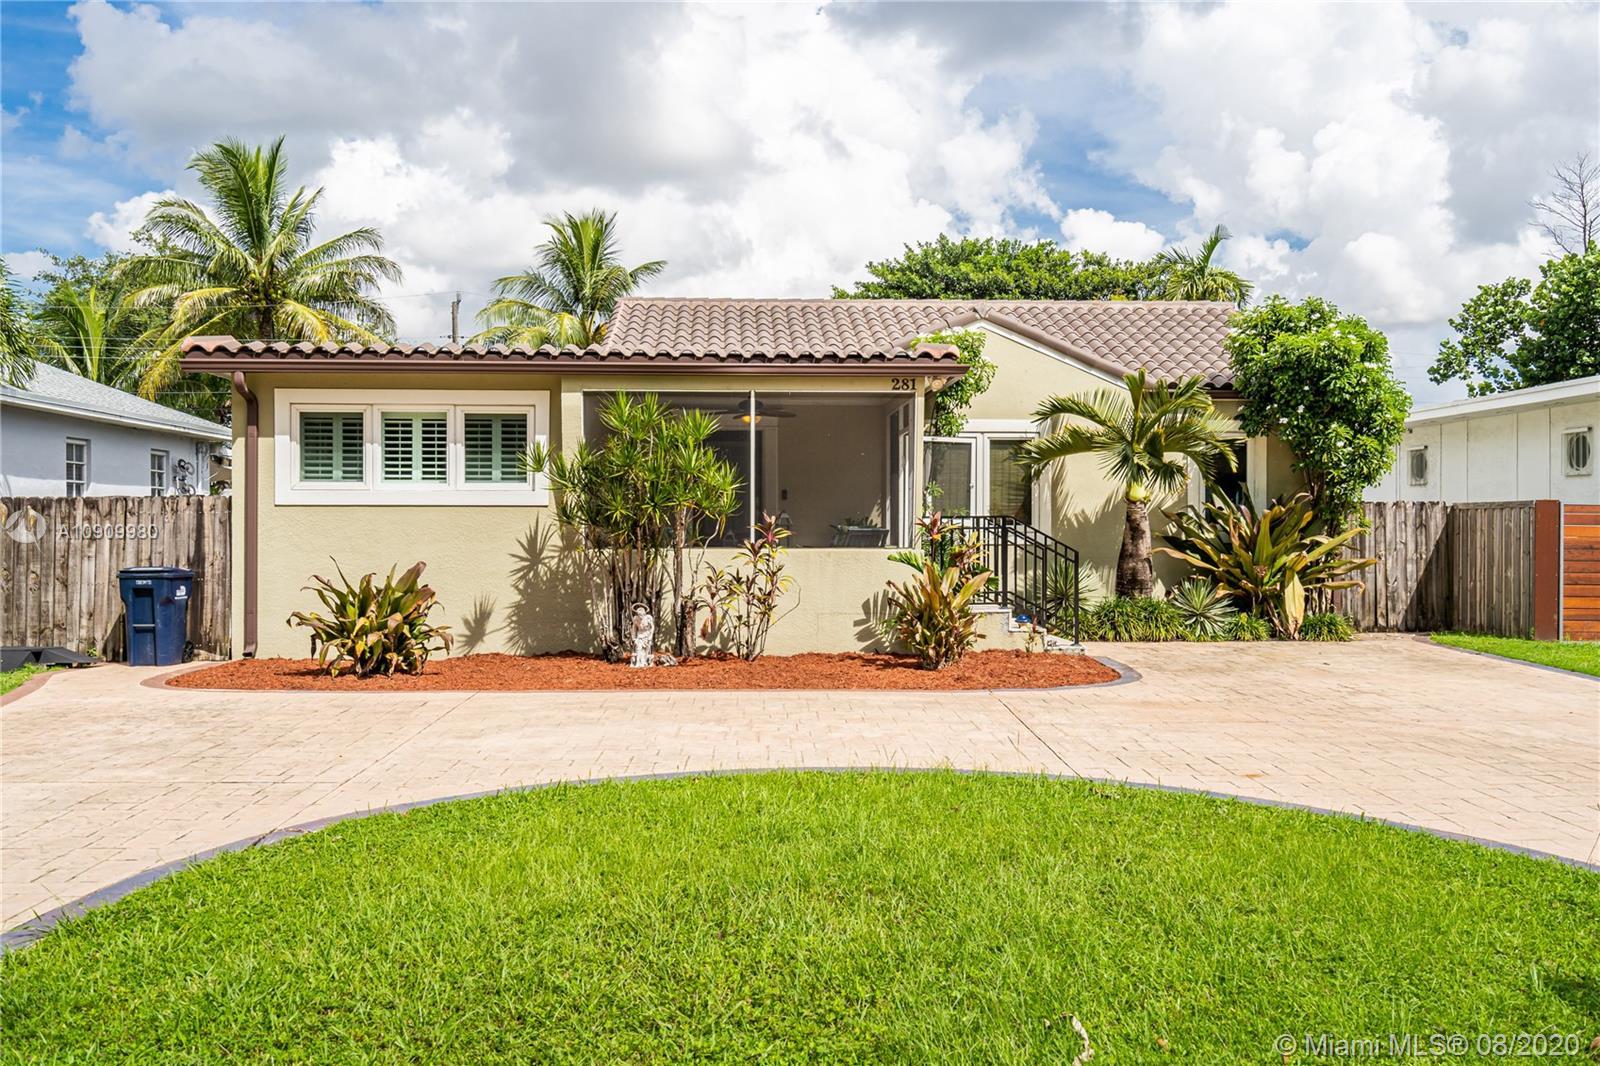 281 N Melrose Dr, Miami Springs FL 33166